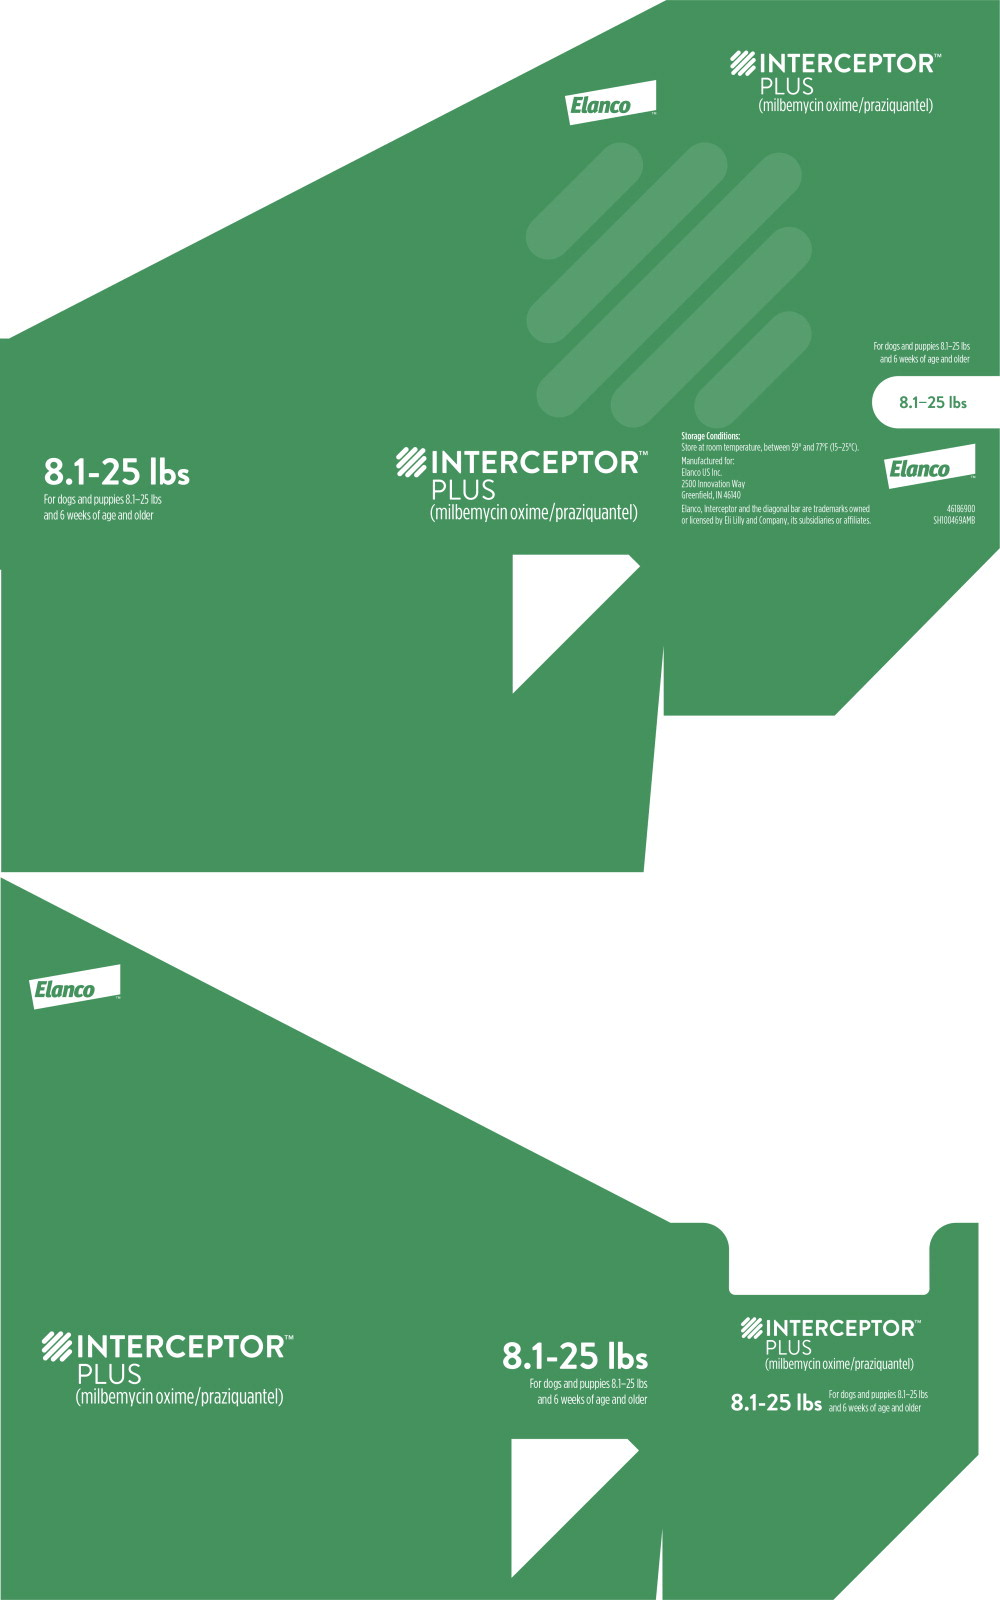 Principal Display Panel - Interceptor Plus 8.1-25 lbs Box Label